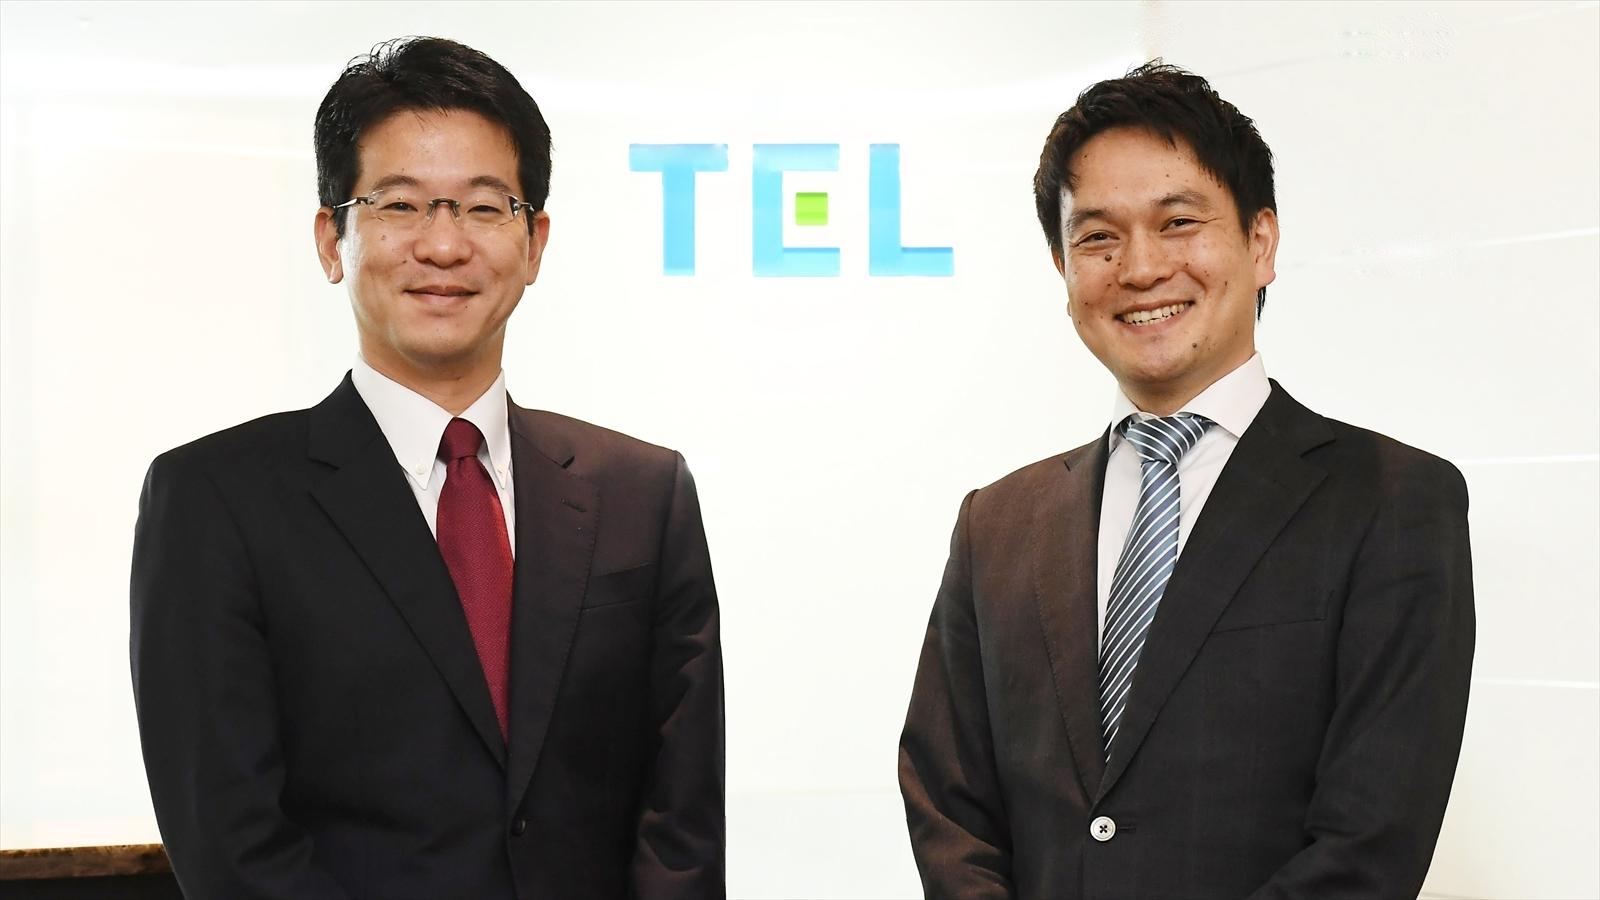 HR Techで生産性を高め、世界シェアNo.1を目指す(東京エレクトロン株式会社)